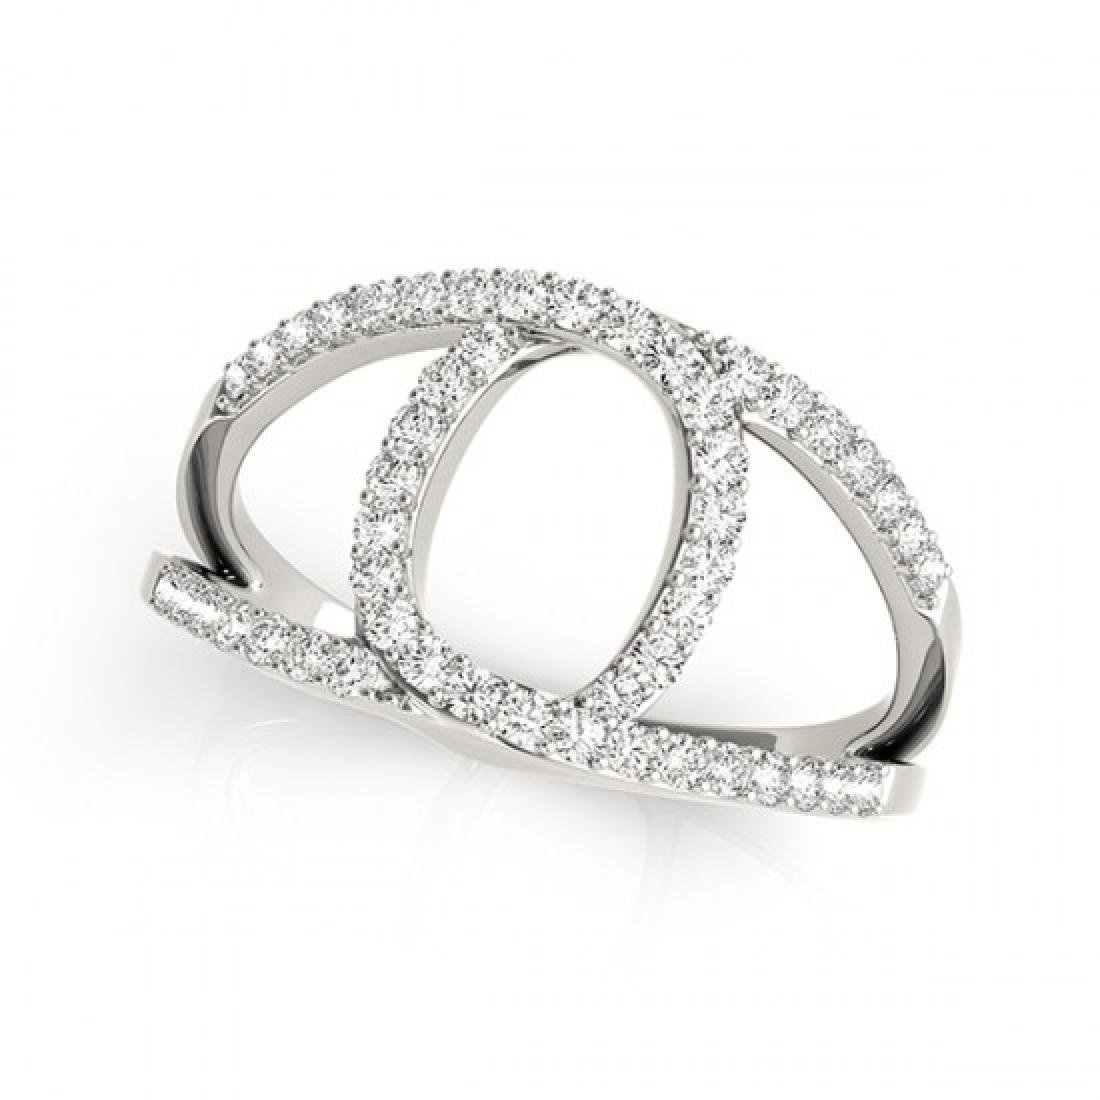 0.65 CTW Certified VS/SI Diamond Fashion Ring 14K White - 2